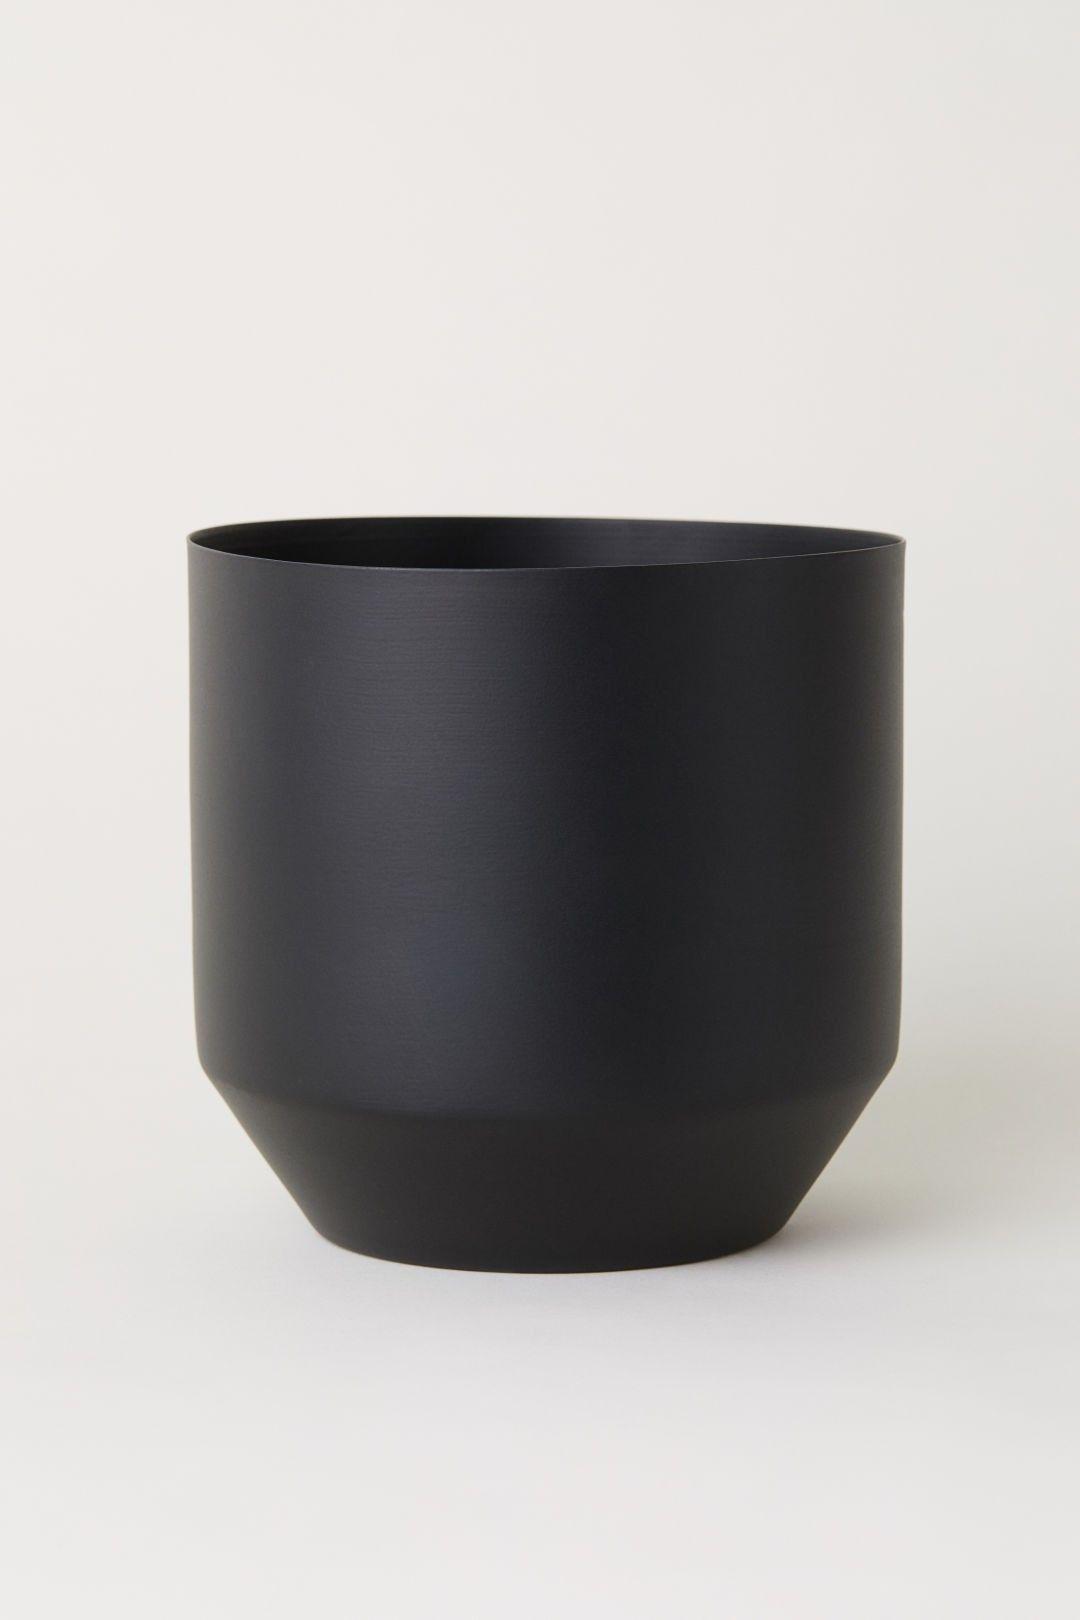 Stunning Design Eye Cather Pot Handmade Emerald Green Patterned Ceramic Pot